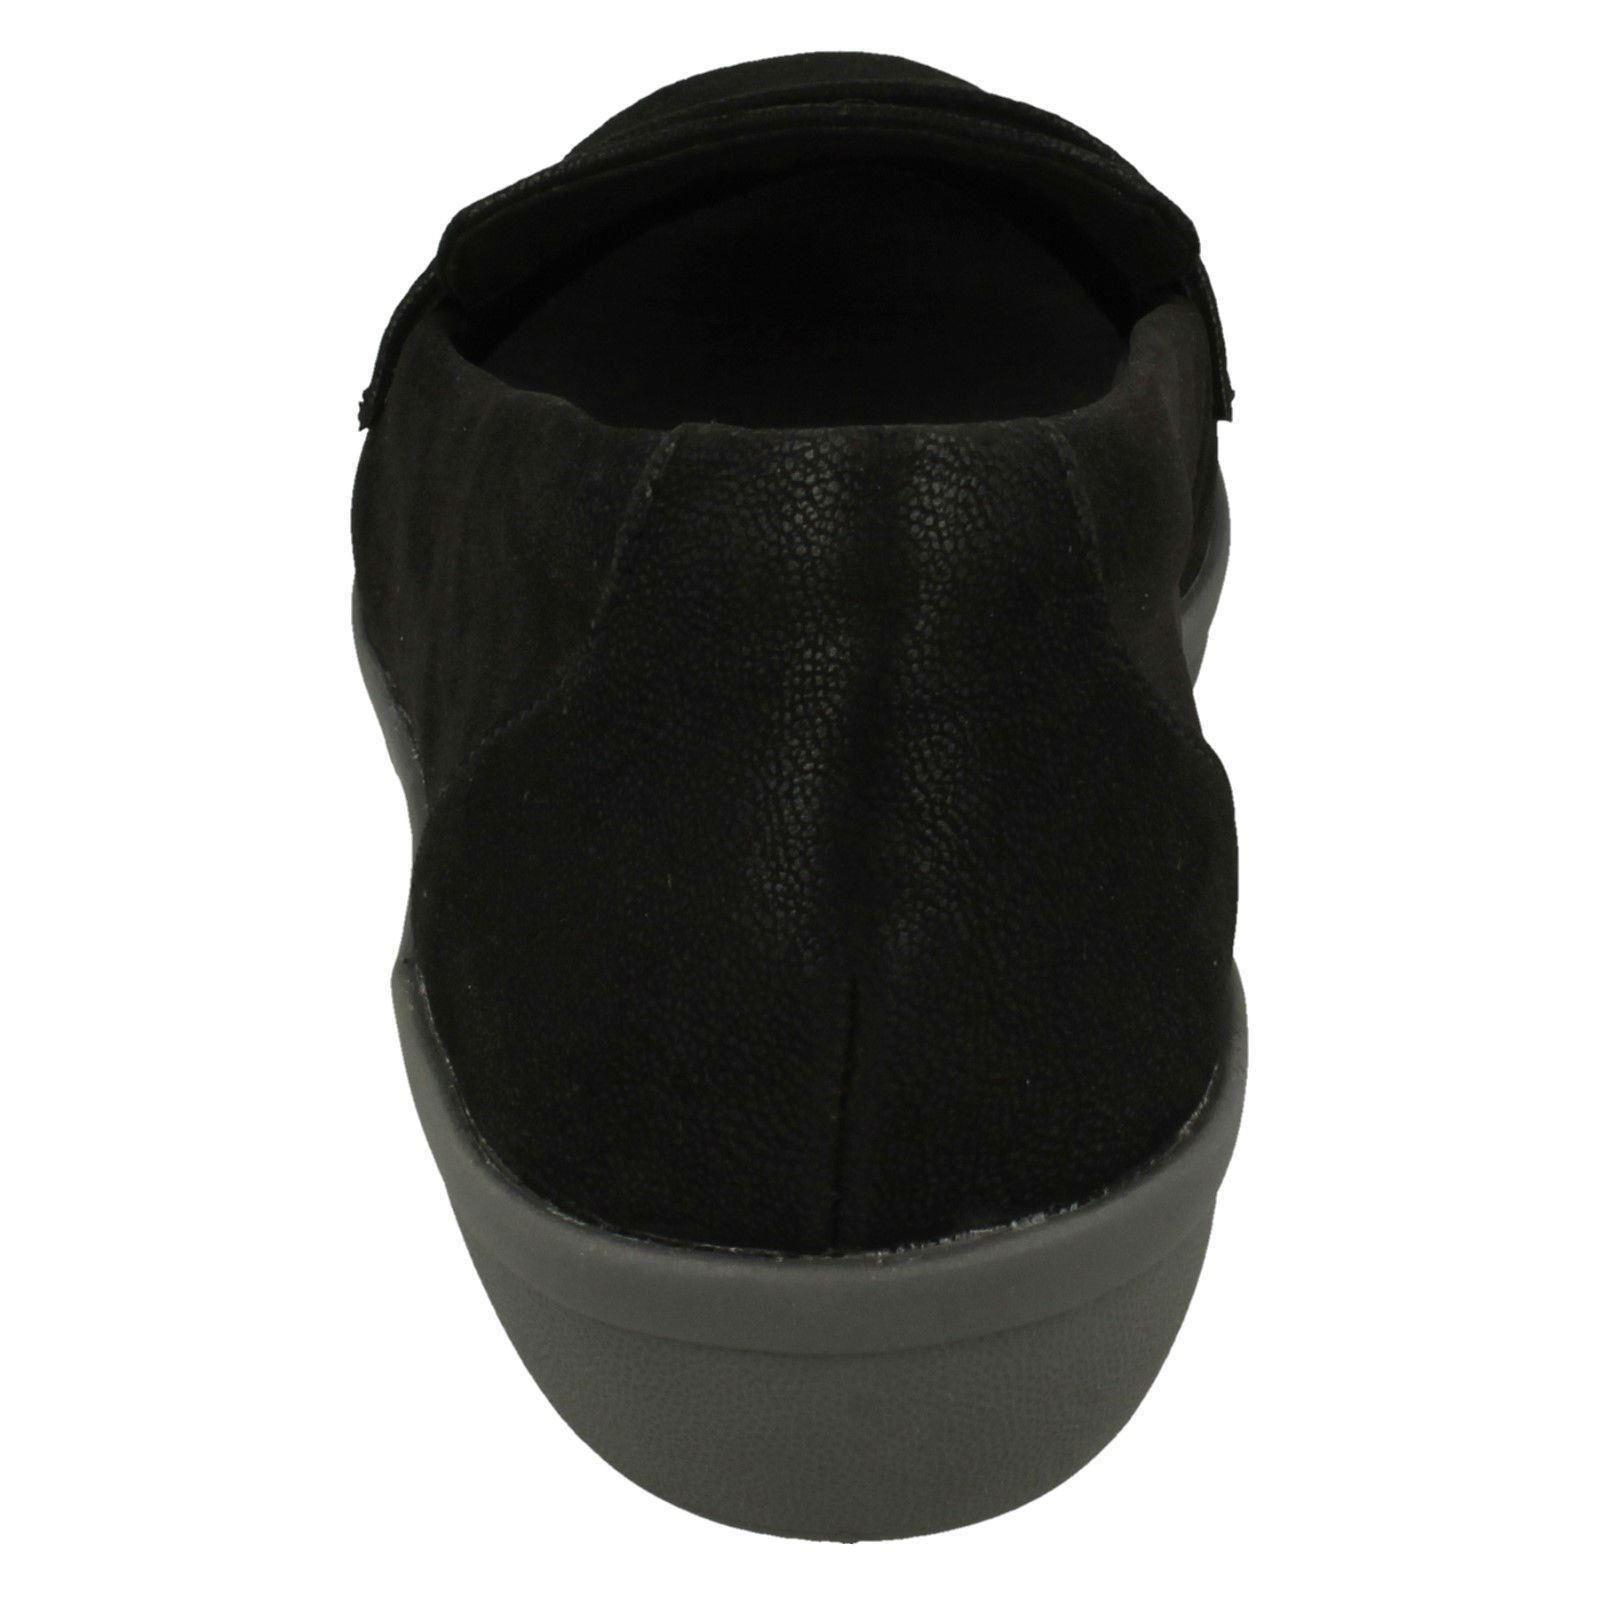 con zapatos de tela damas Ayla de Steppers Clarks antideslizantes Cloud Form estilo Zapatos Black para qzaYgxw